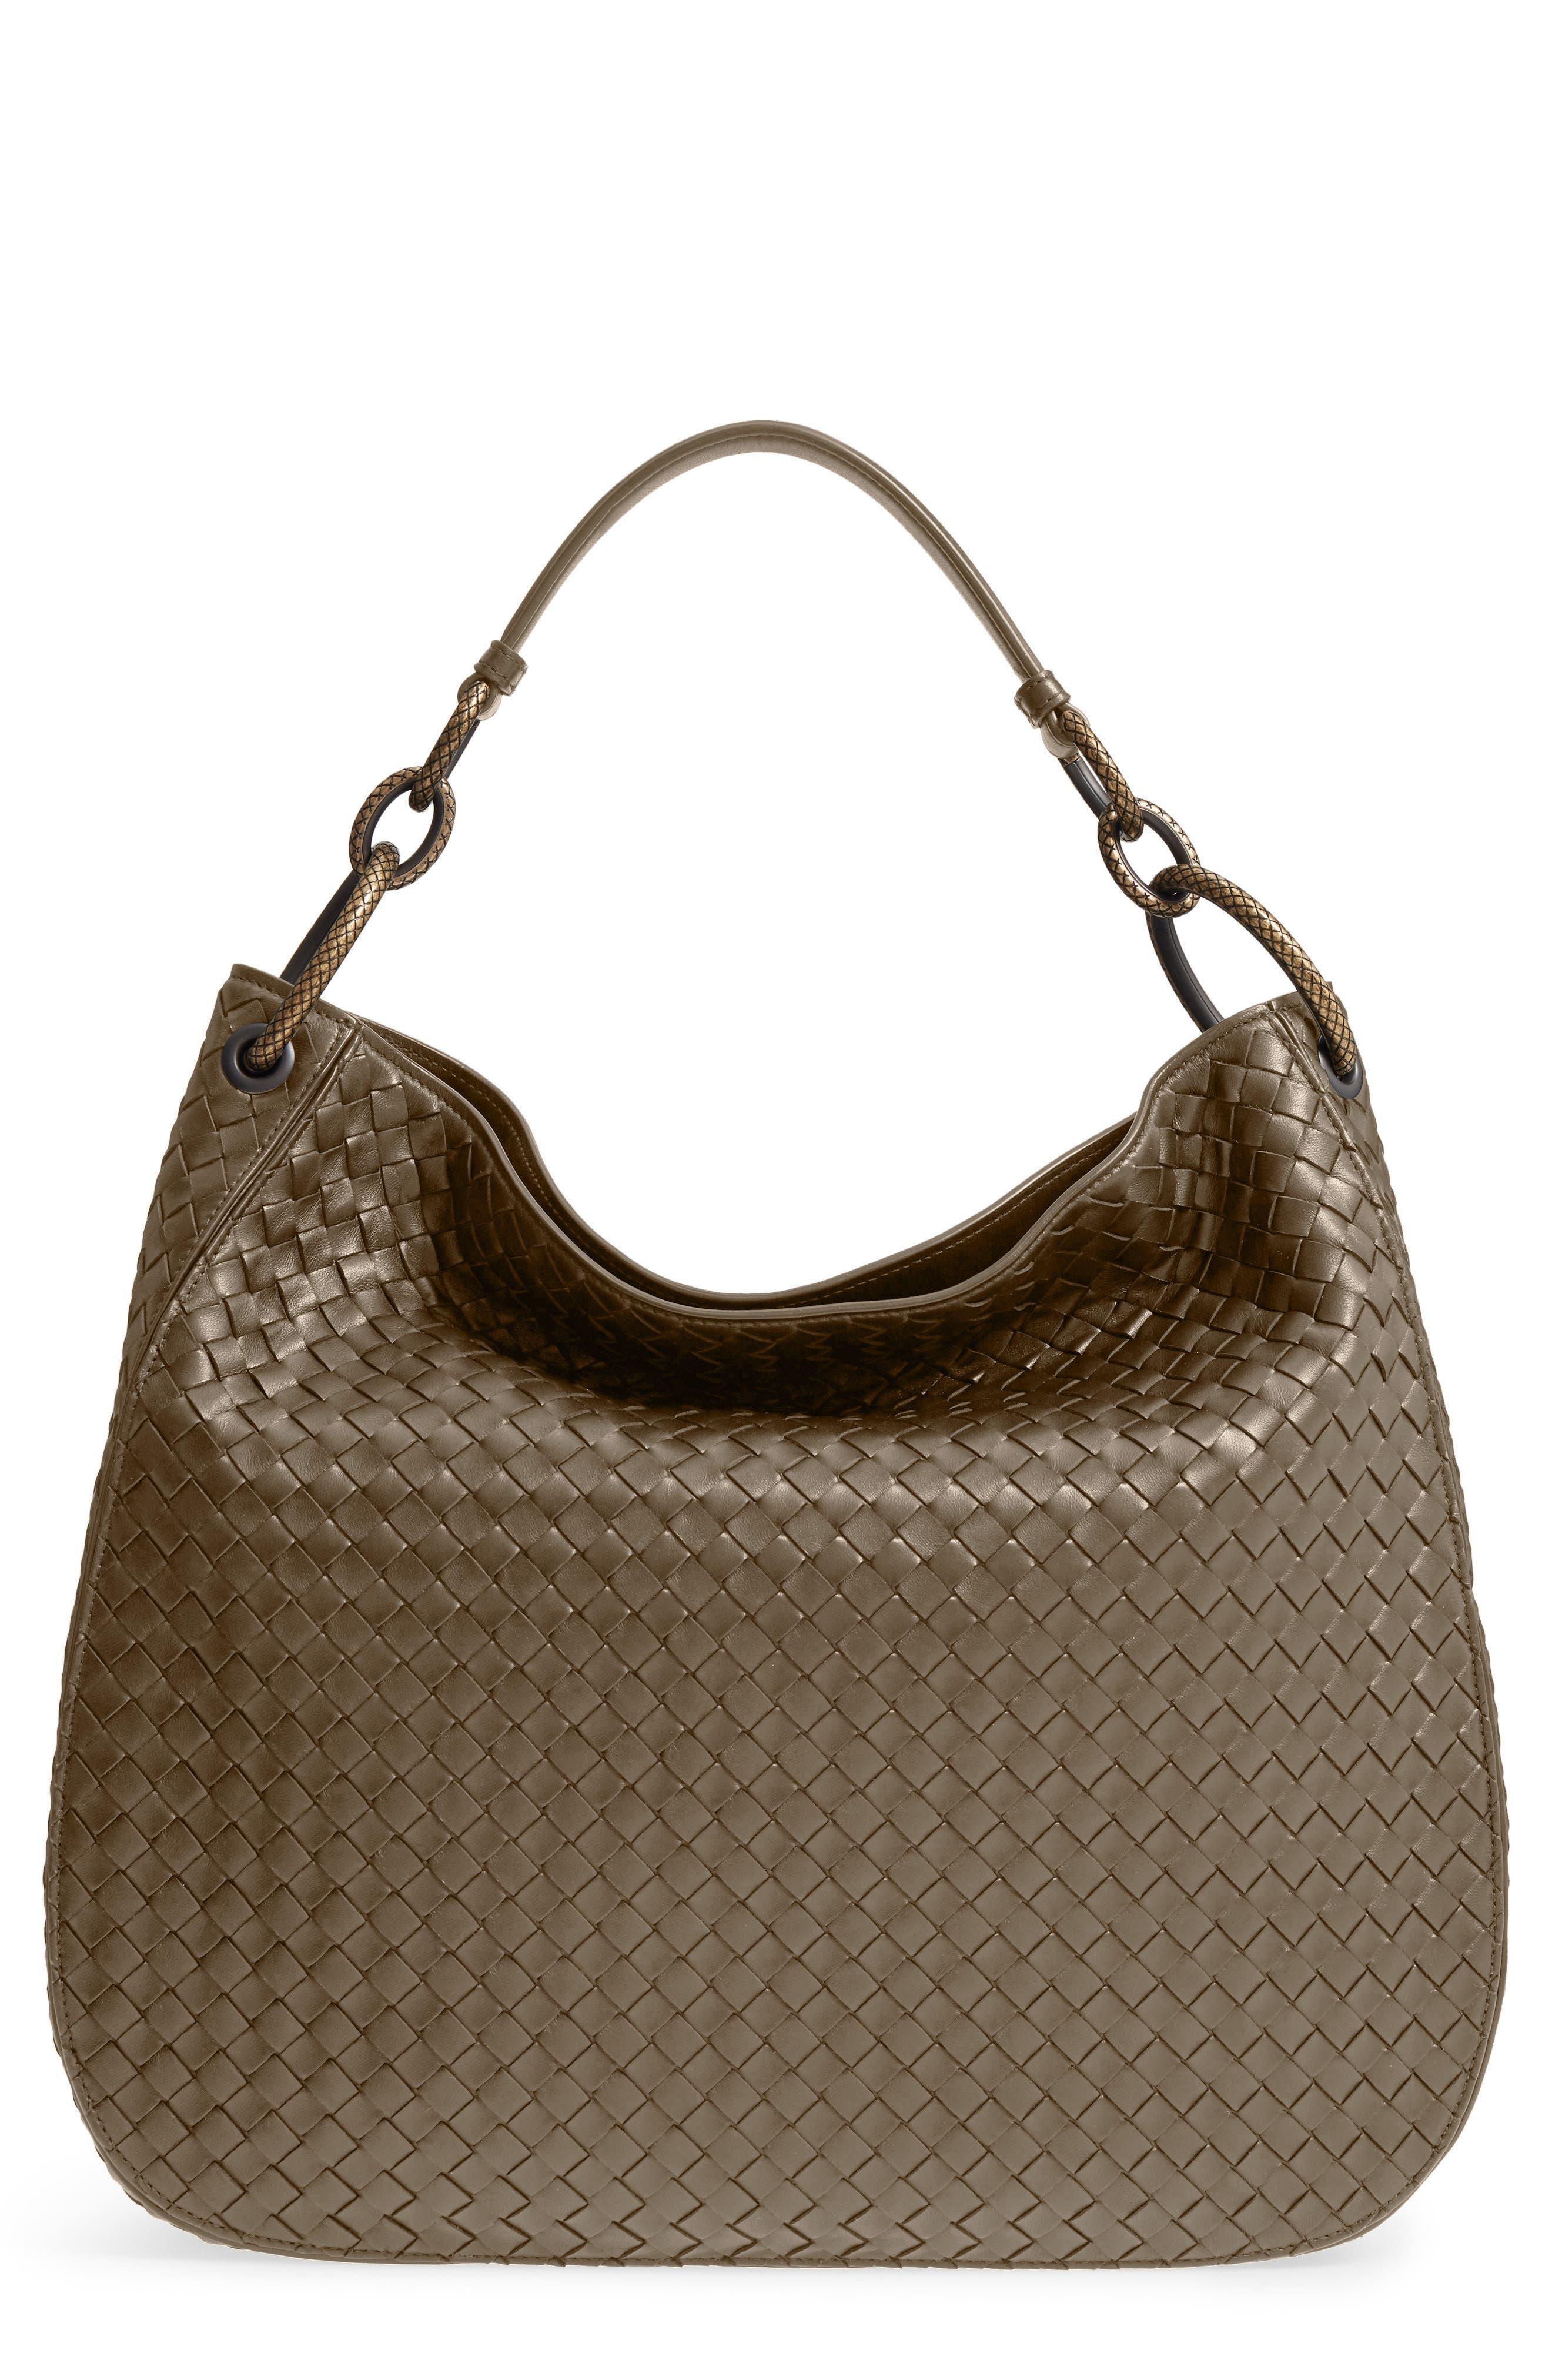 Bottega Veneta Large Loop Woven Leather Hobo